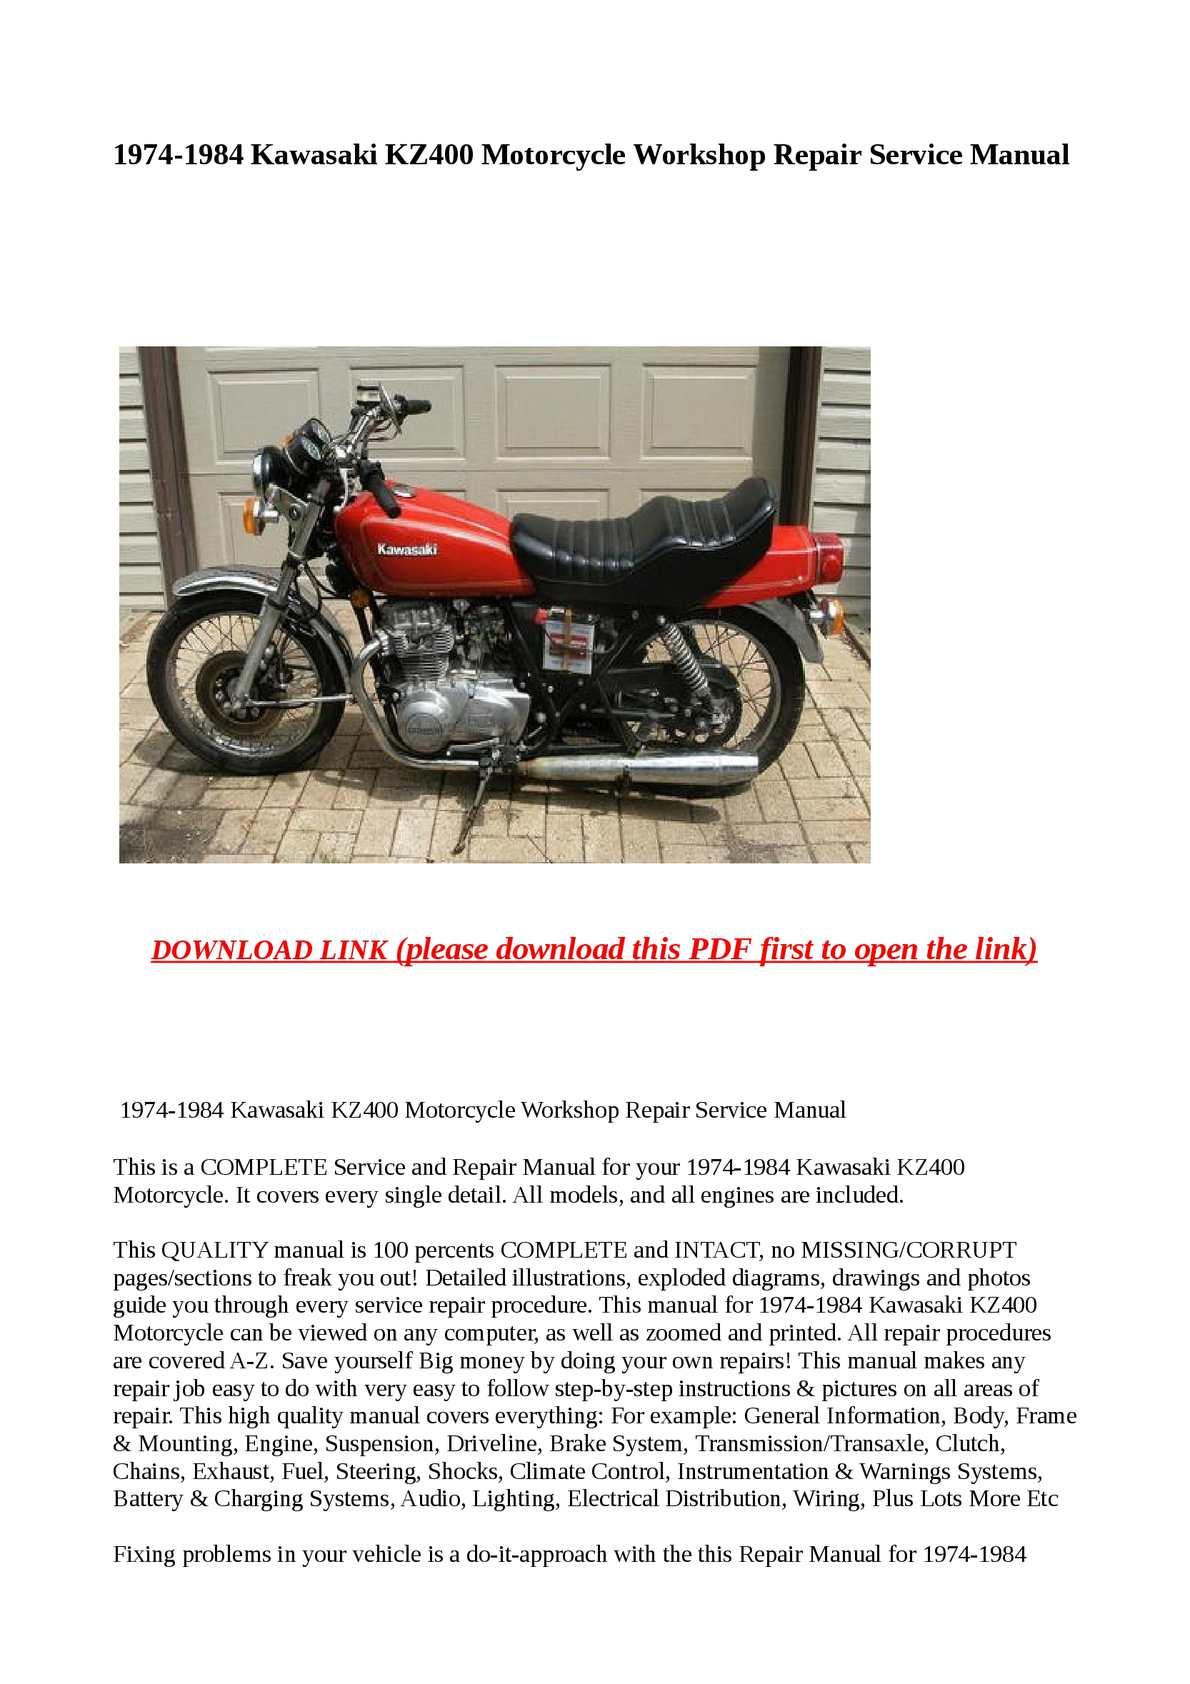 Calameo 1974 1984 Kawasaki Kz400 Motorcycle Workshop Repair Service Manu